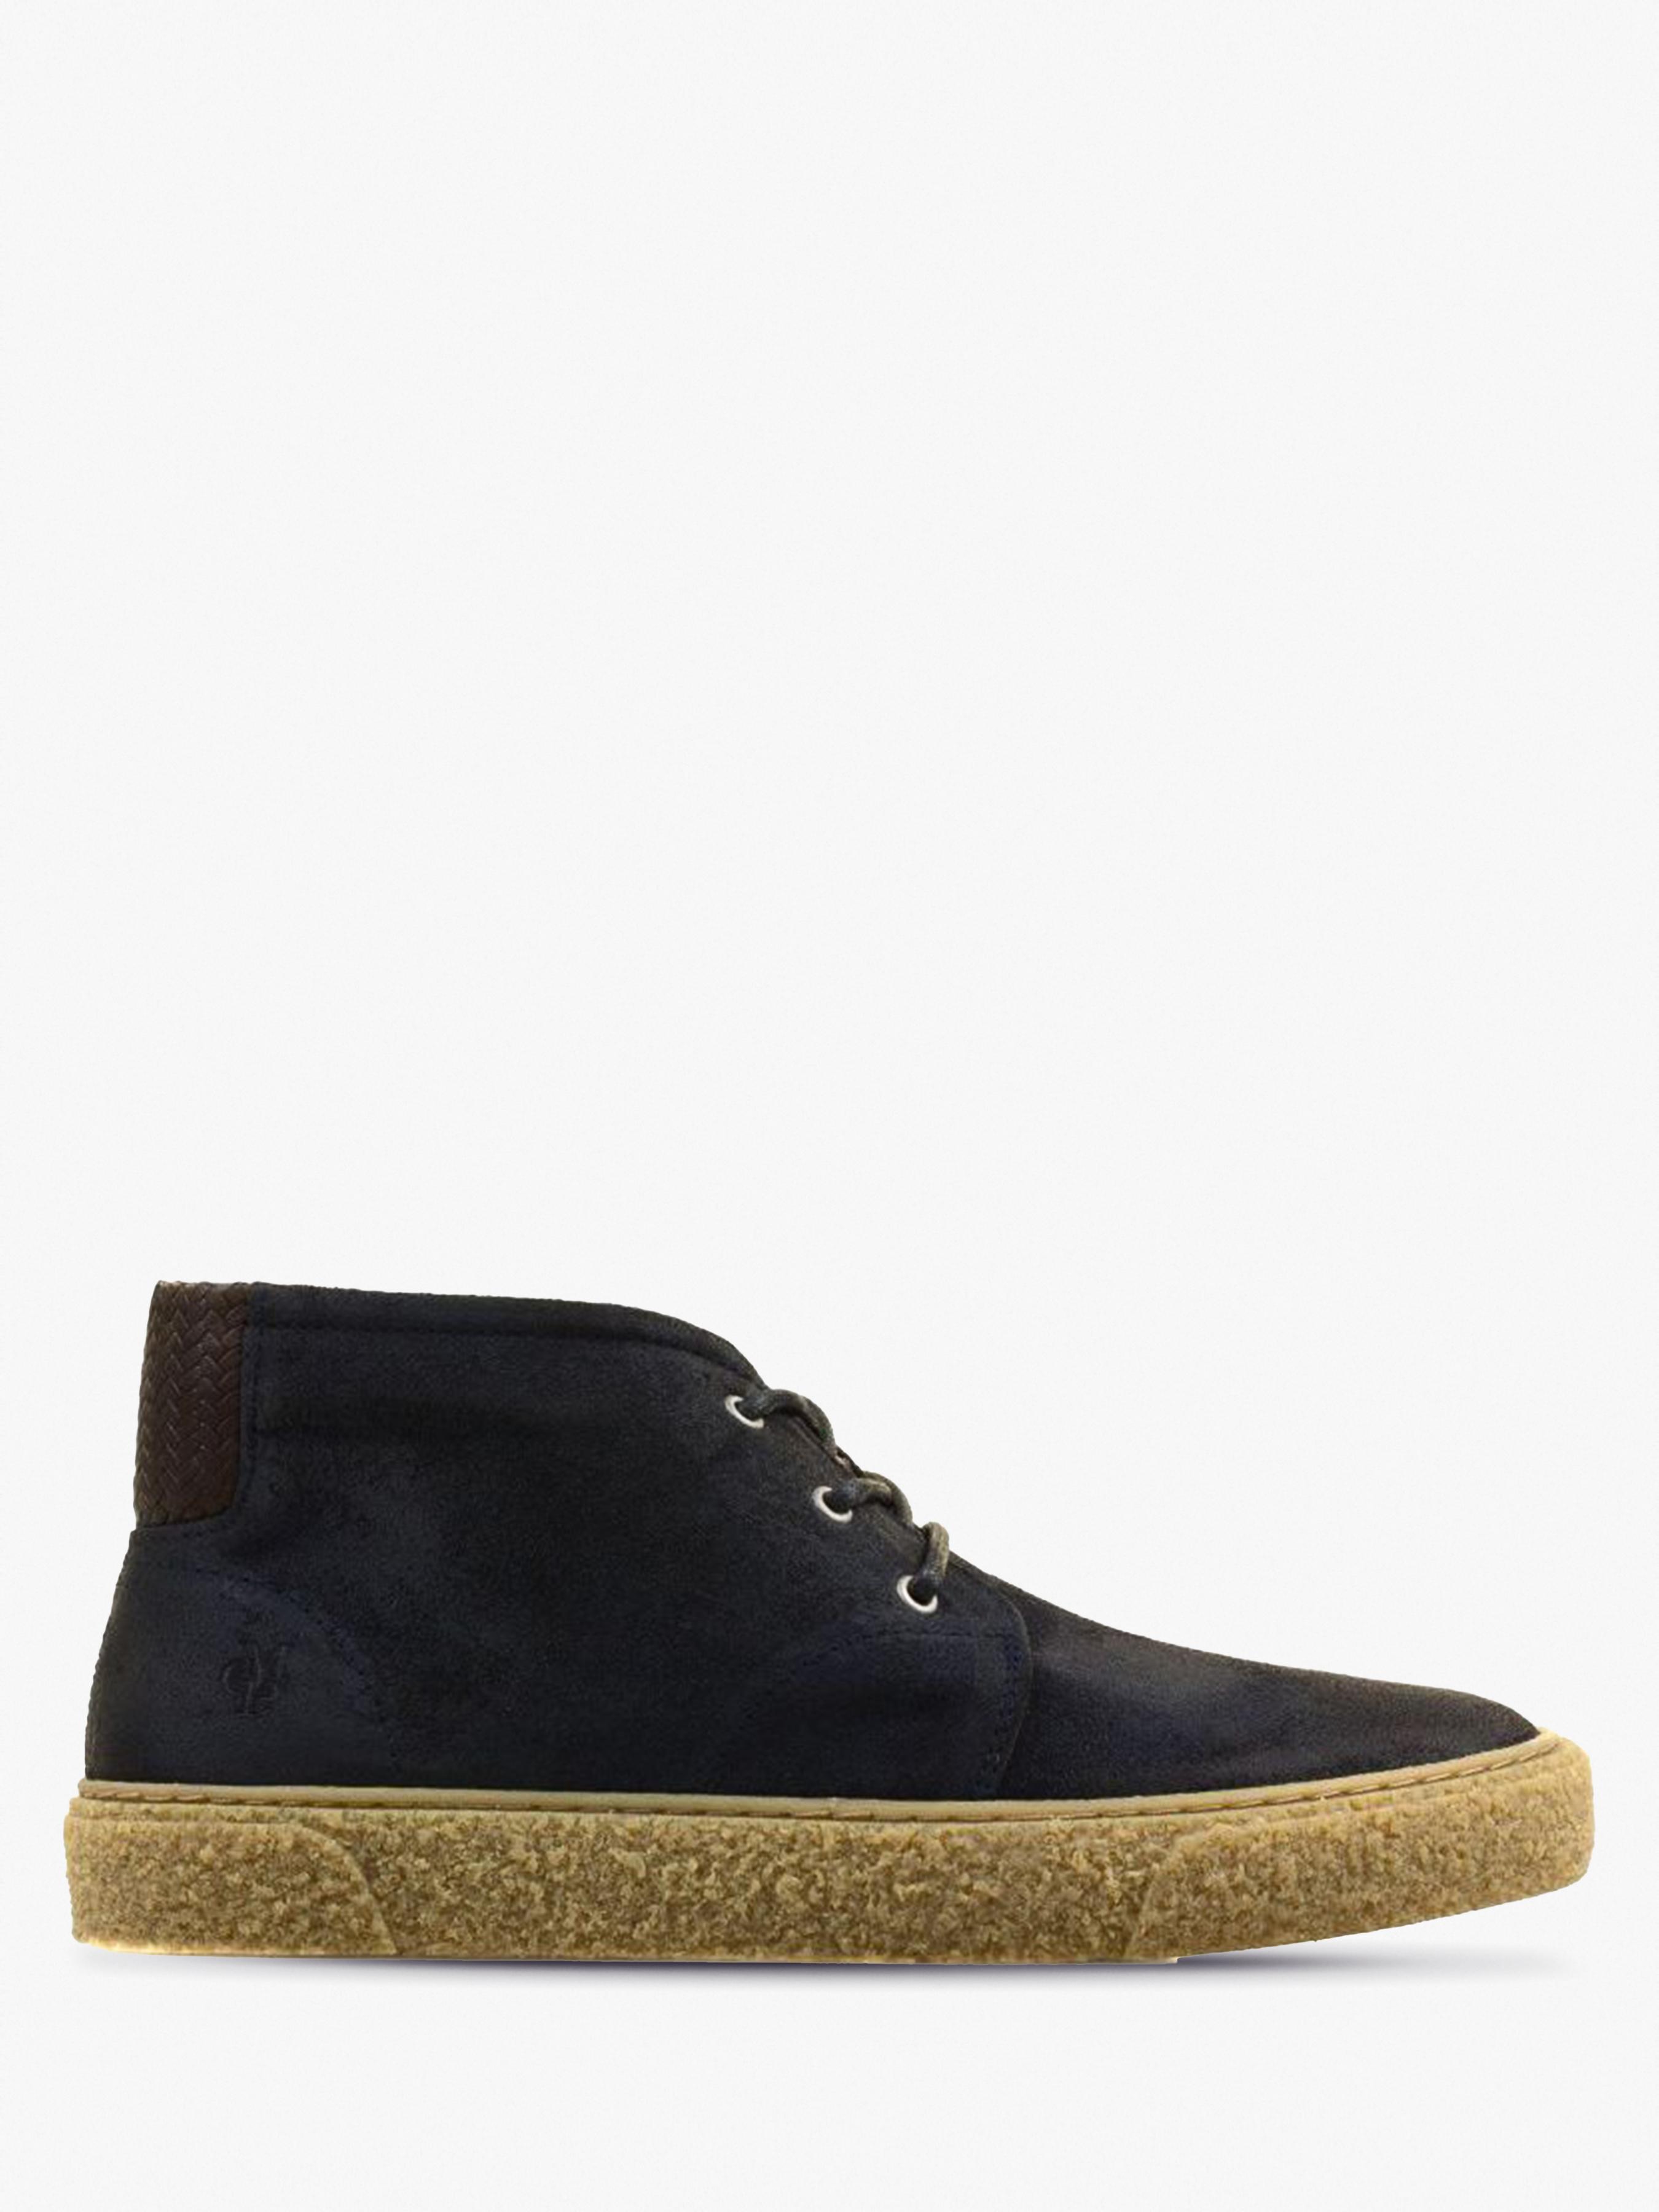 Ботинки мужские MARC O'POLO PO317 размерная сетка обуви, 2017